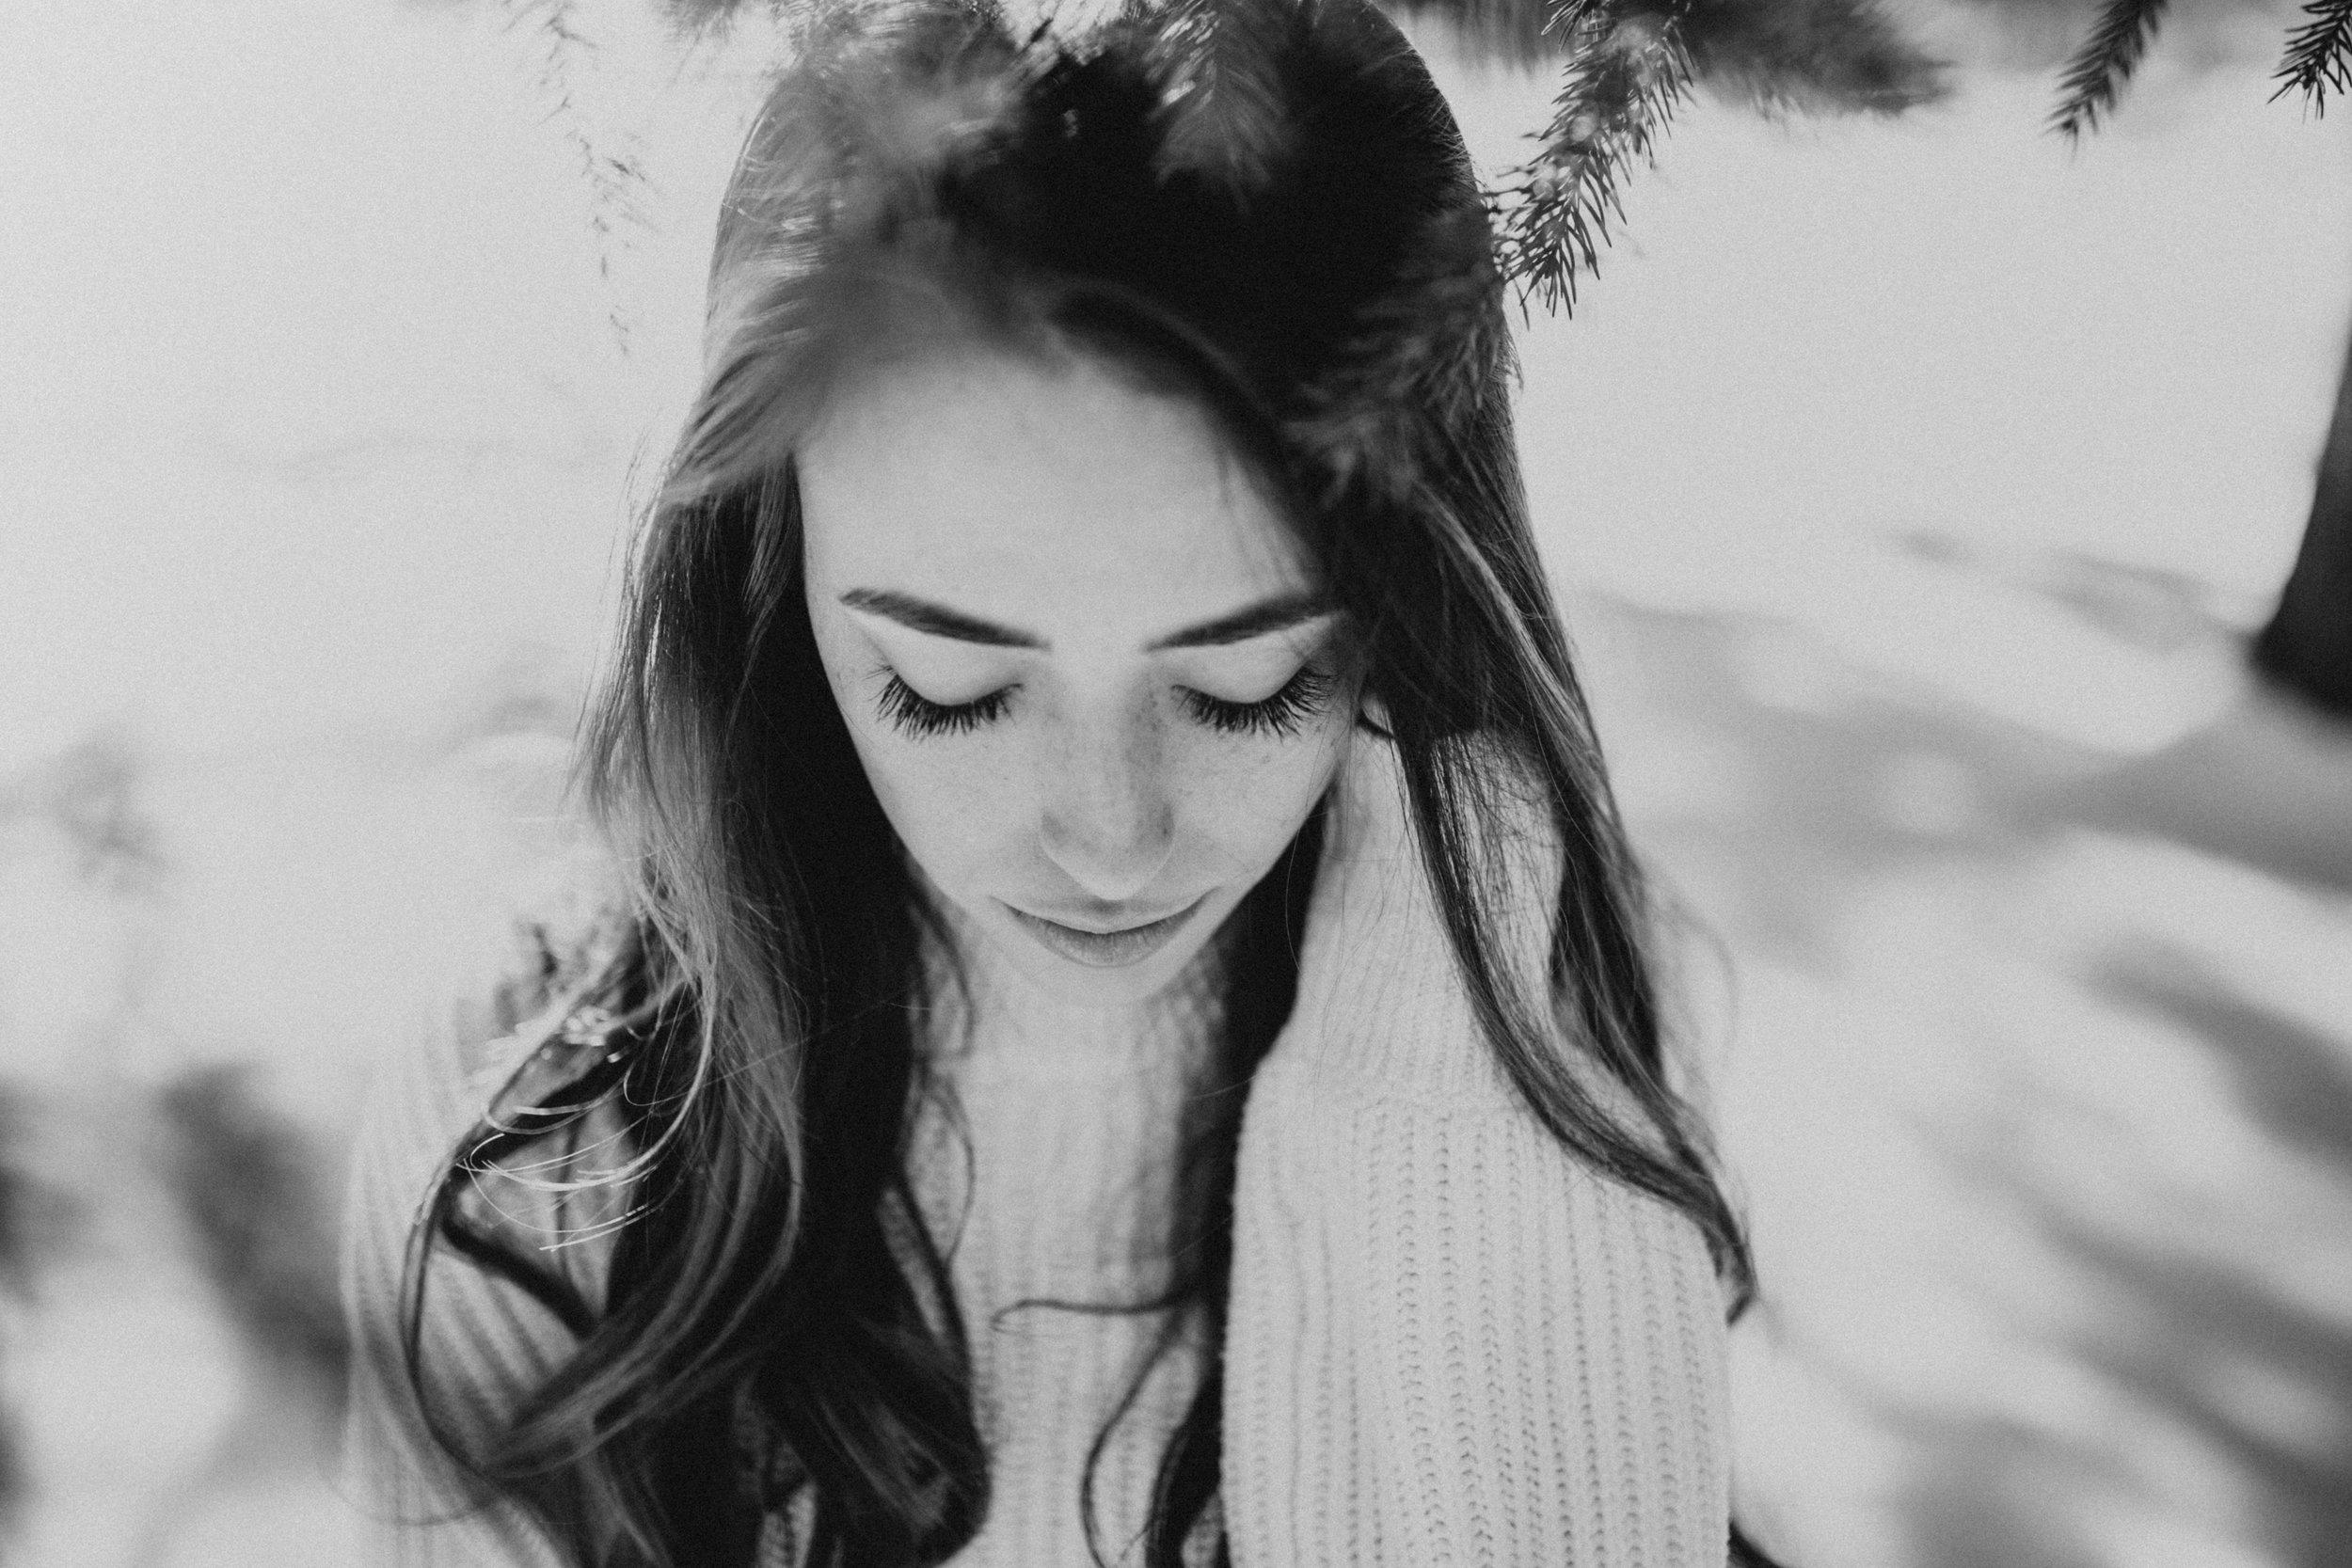 Arianna_Portraiture_10.jpg